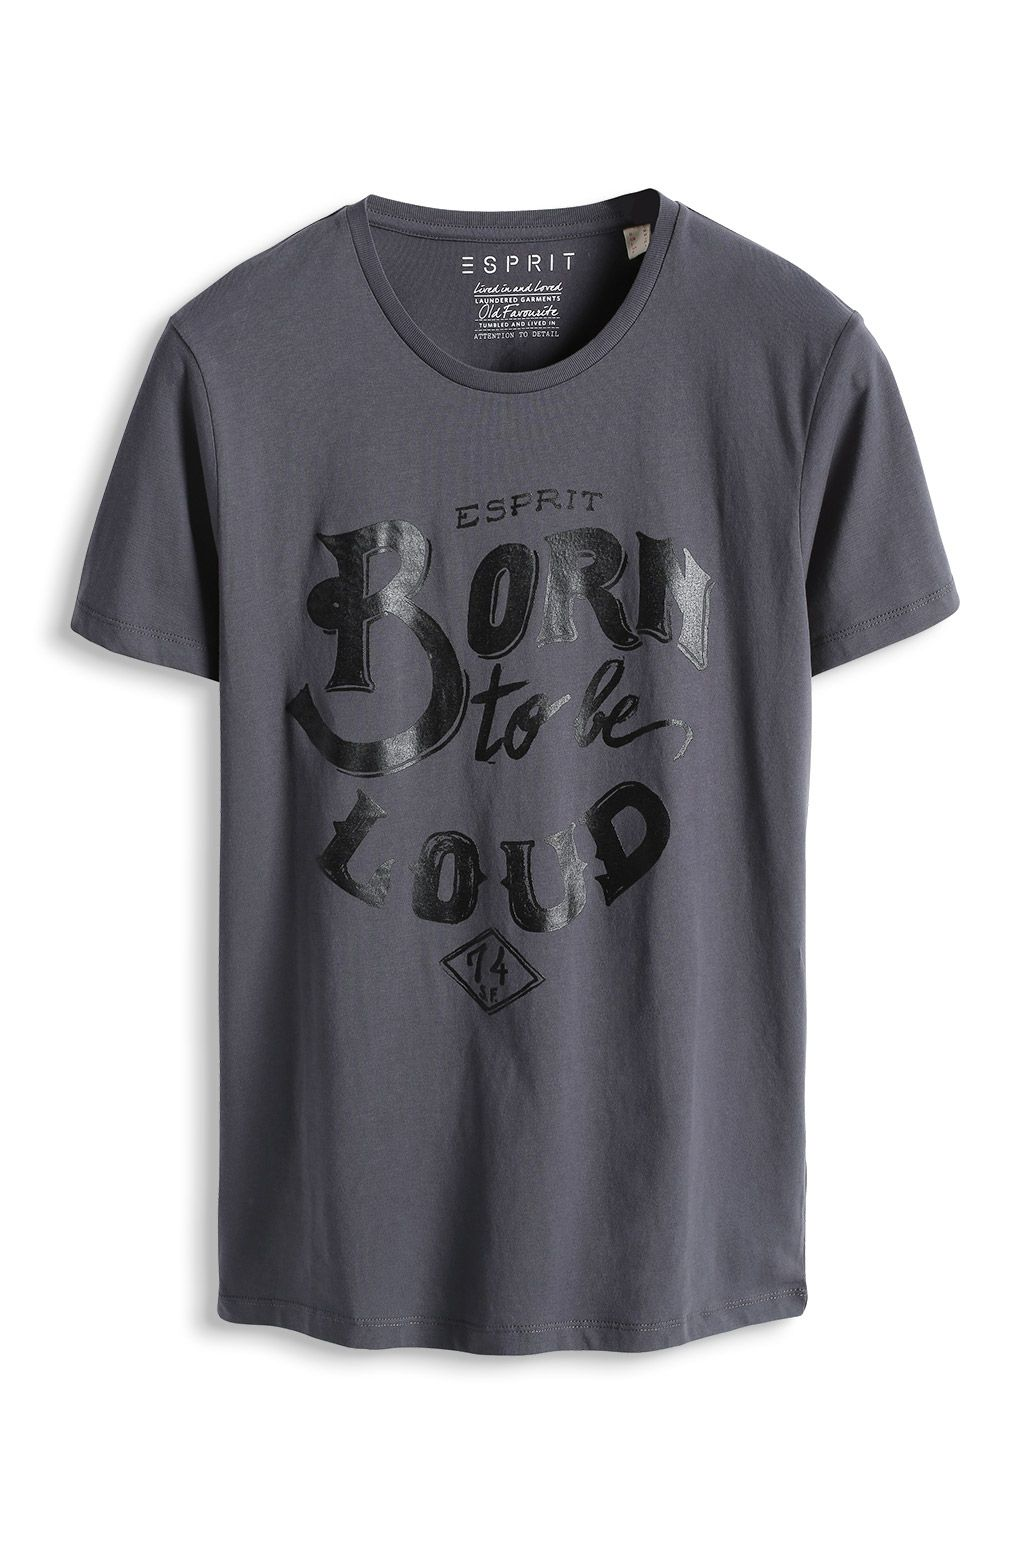 www.davidemartini.ink for Esprit - Baumwoll Jersey Print T-Shirt im Online c14b140468219